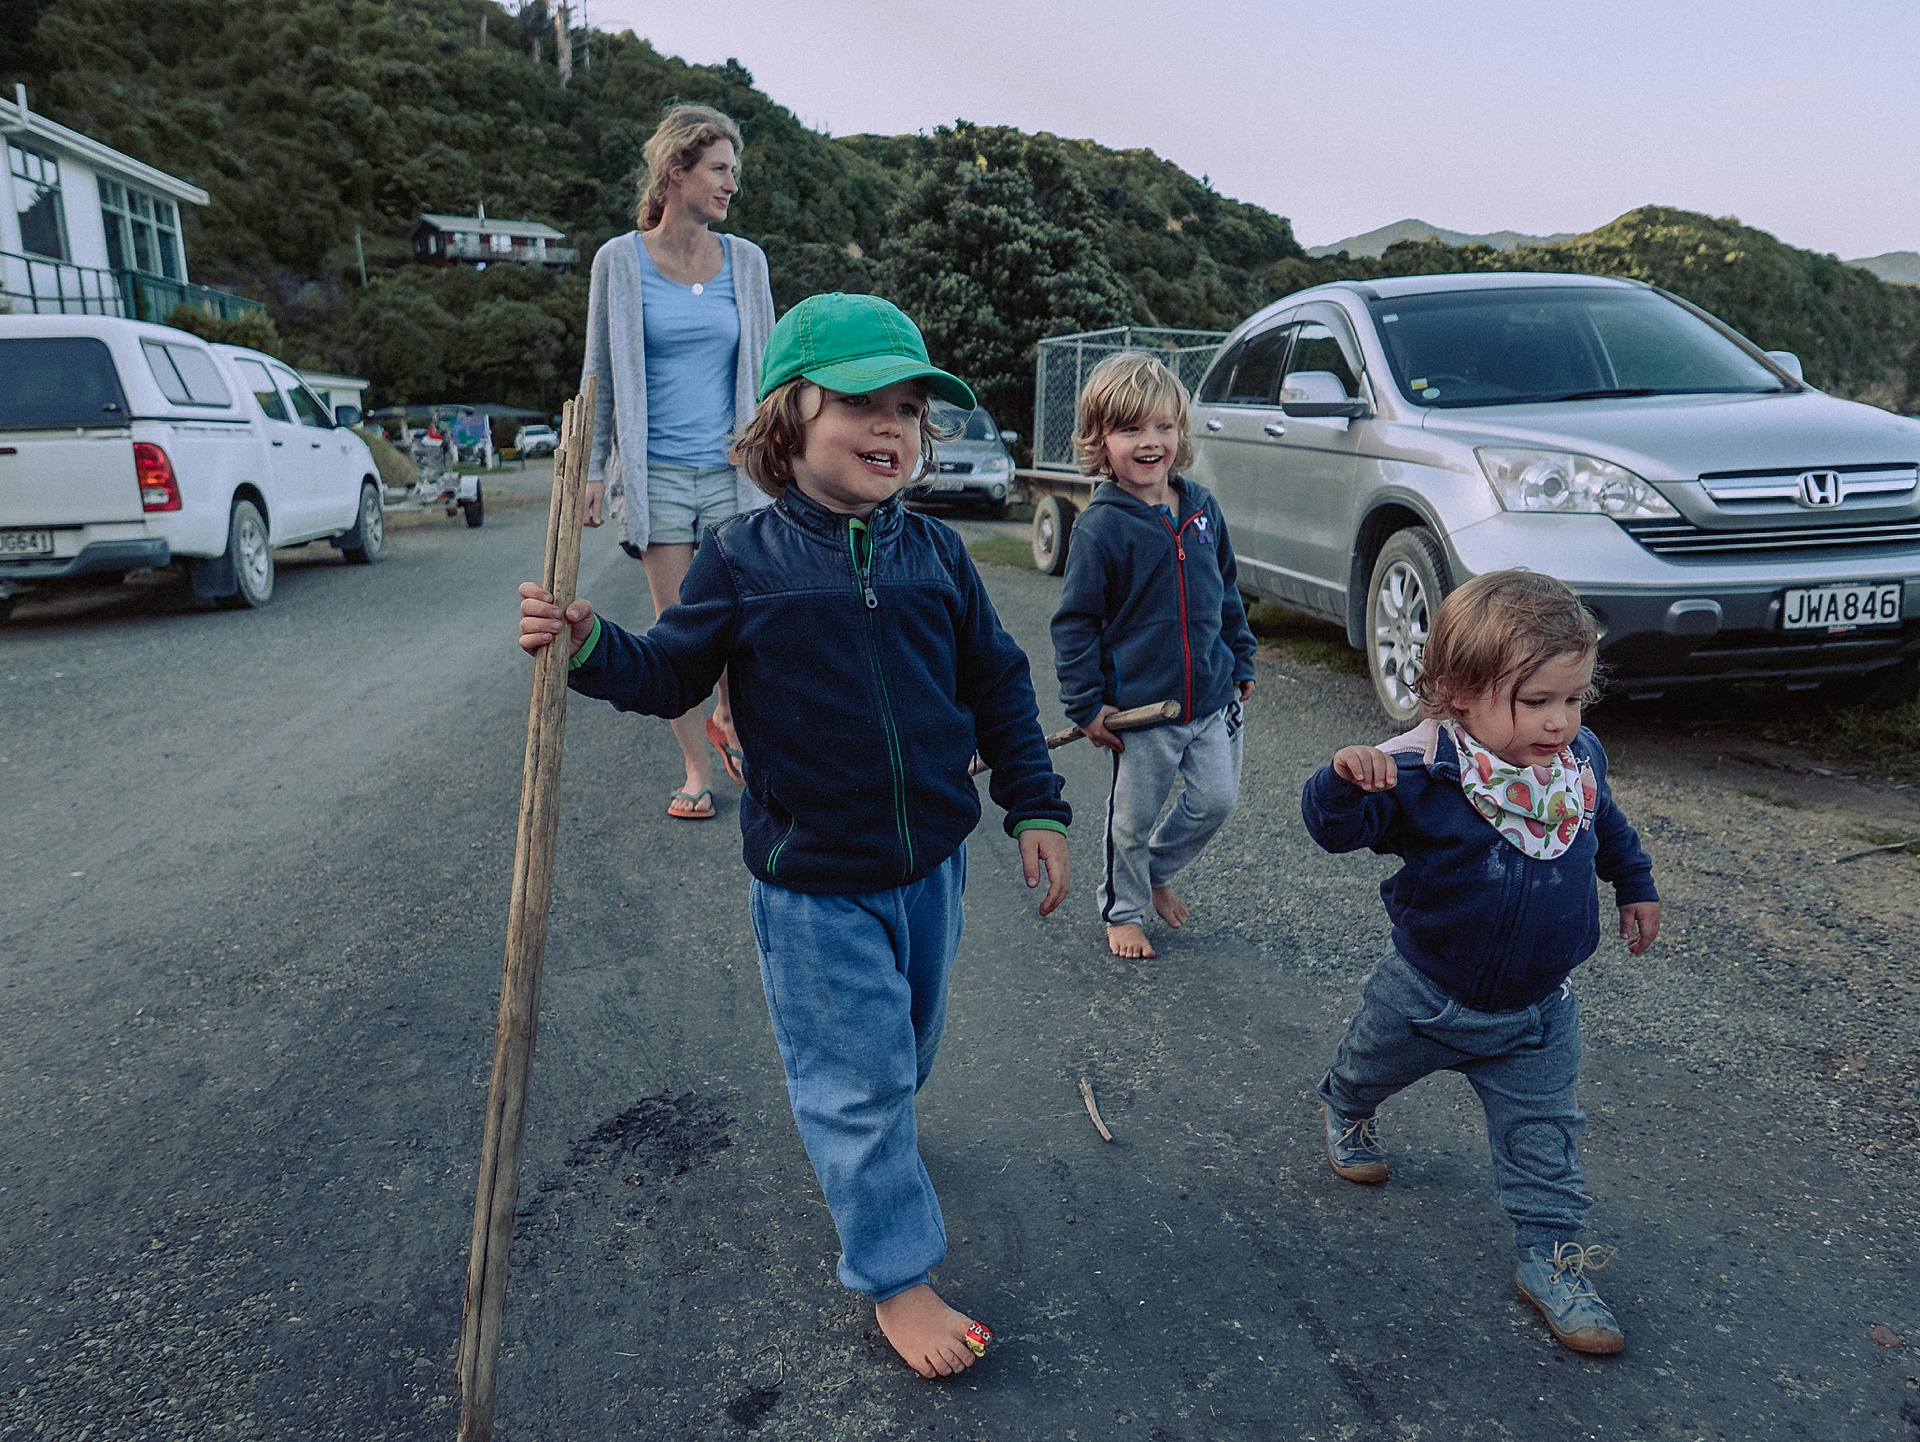 family-roadtrip-neuseeland-travelnewzealand-danielzube_0657.jpg